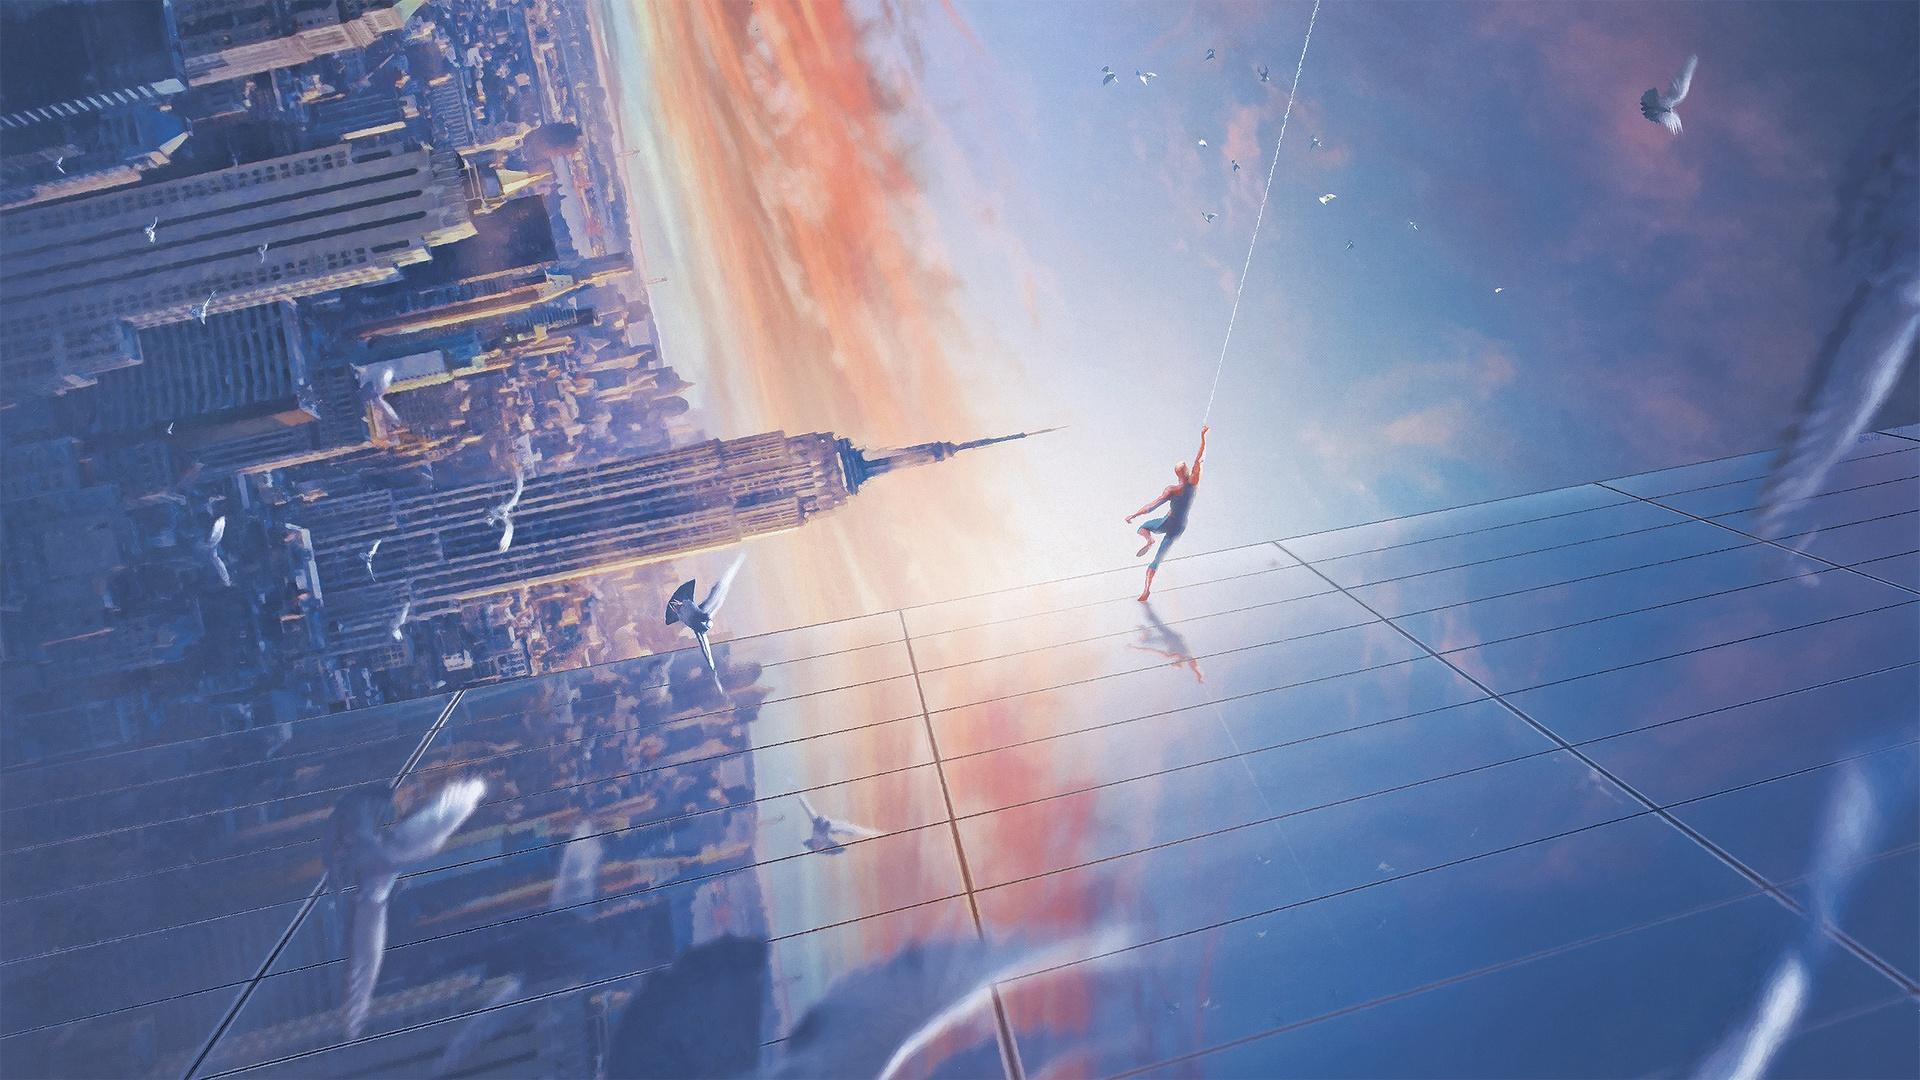 General 1920x1080 Marvel Super Heroes artwork city cityscape Spider-Man